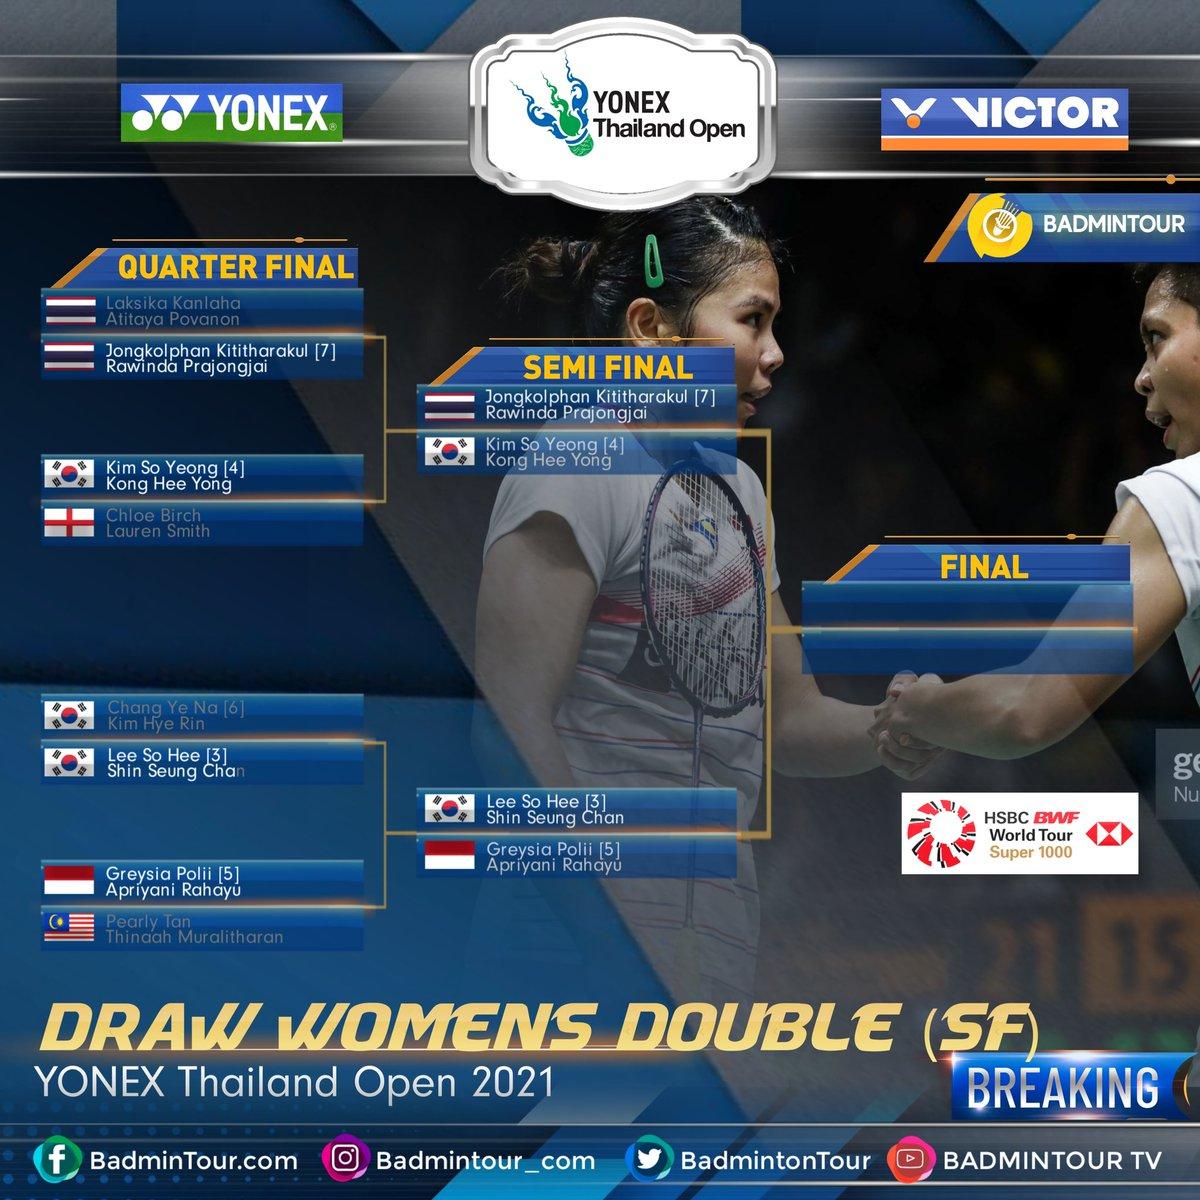 BREAKINGGGG😍😍😍 #YonexThailandOpen  Here Are LIST DRAWING (SEMI FINAL) (Womens Double) YONEX Thailand Open 2021 (HSBC BWF World Tour Super 1000 https://t.co/cNovgawbyV